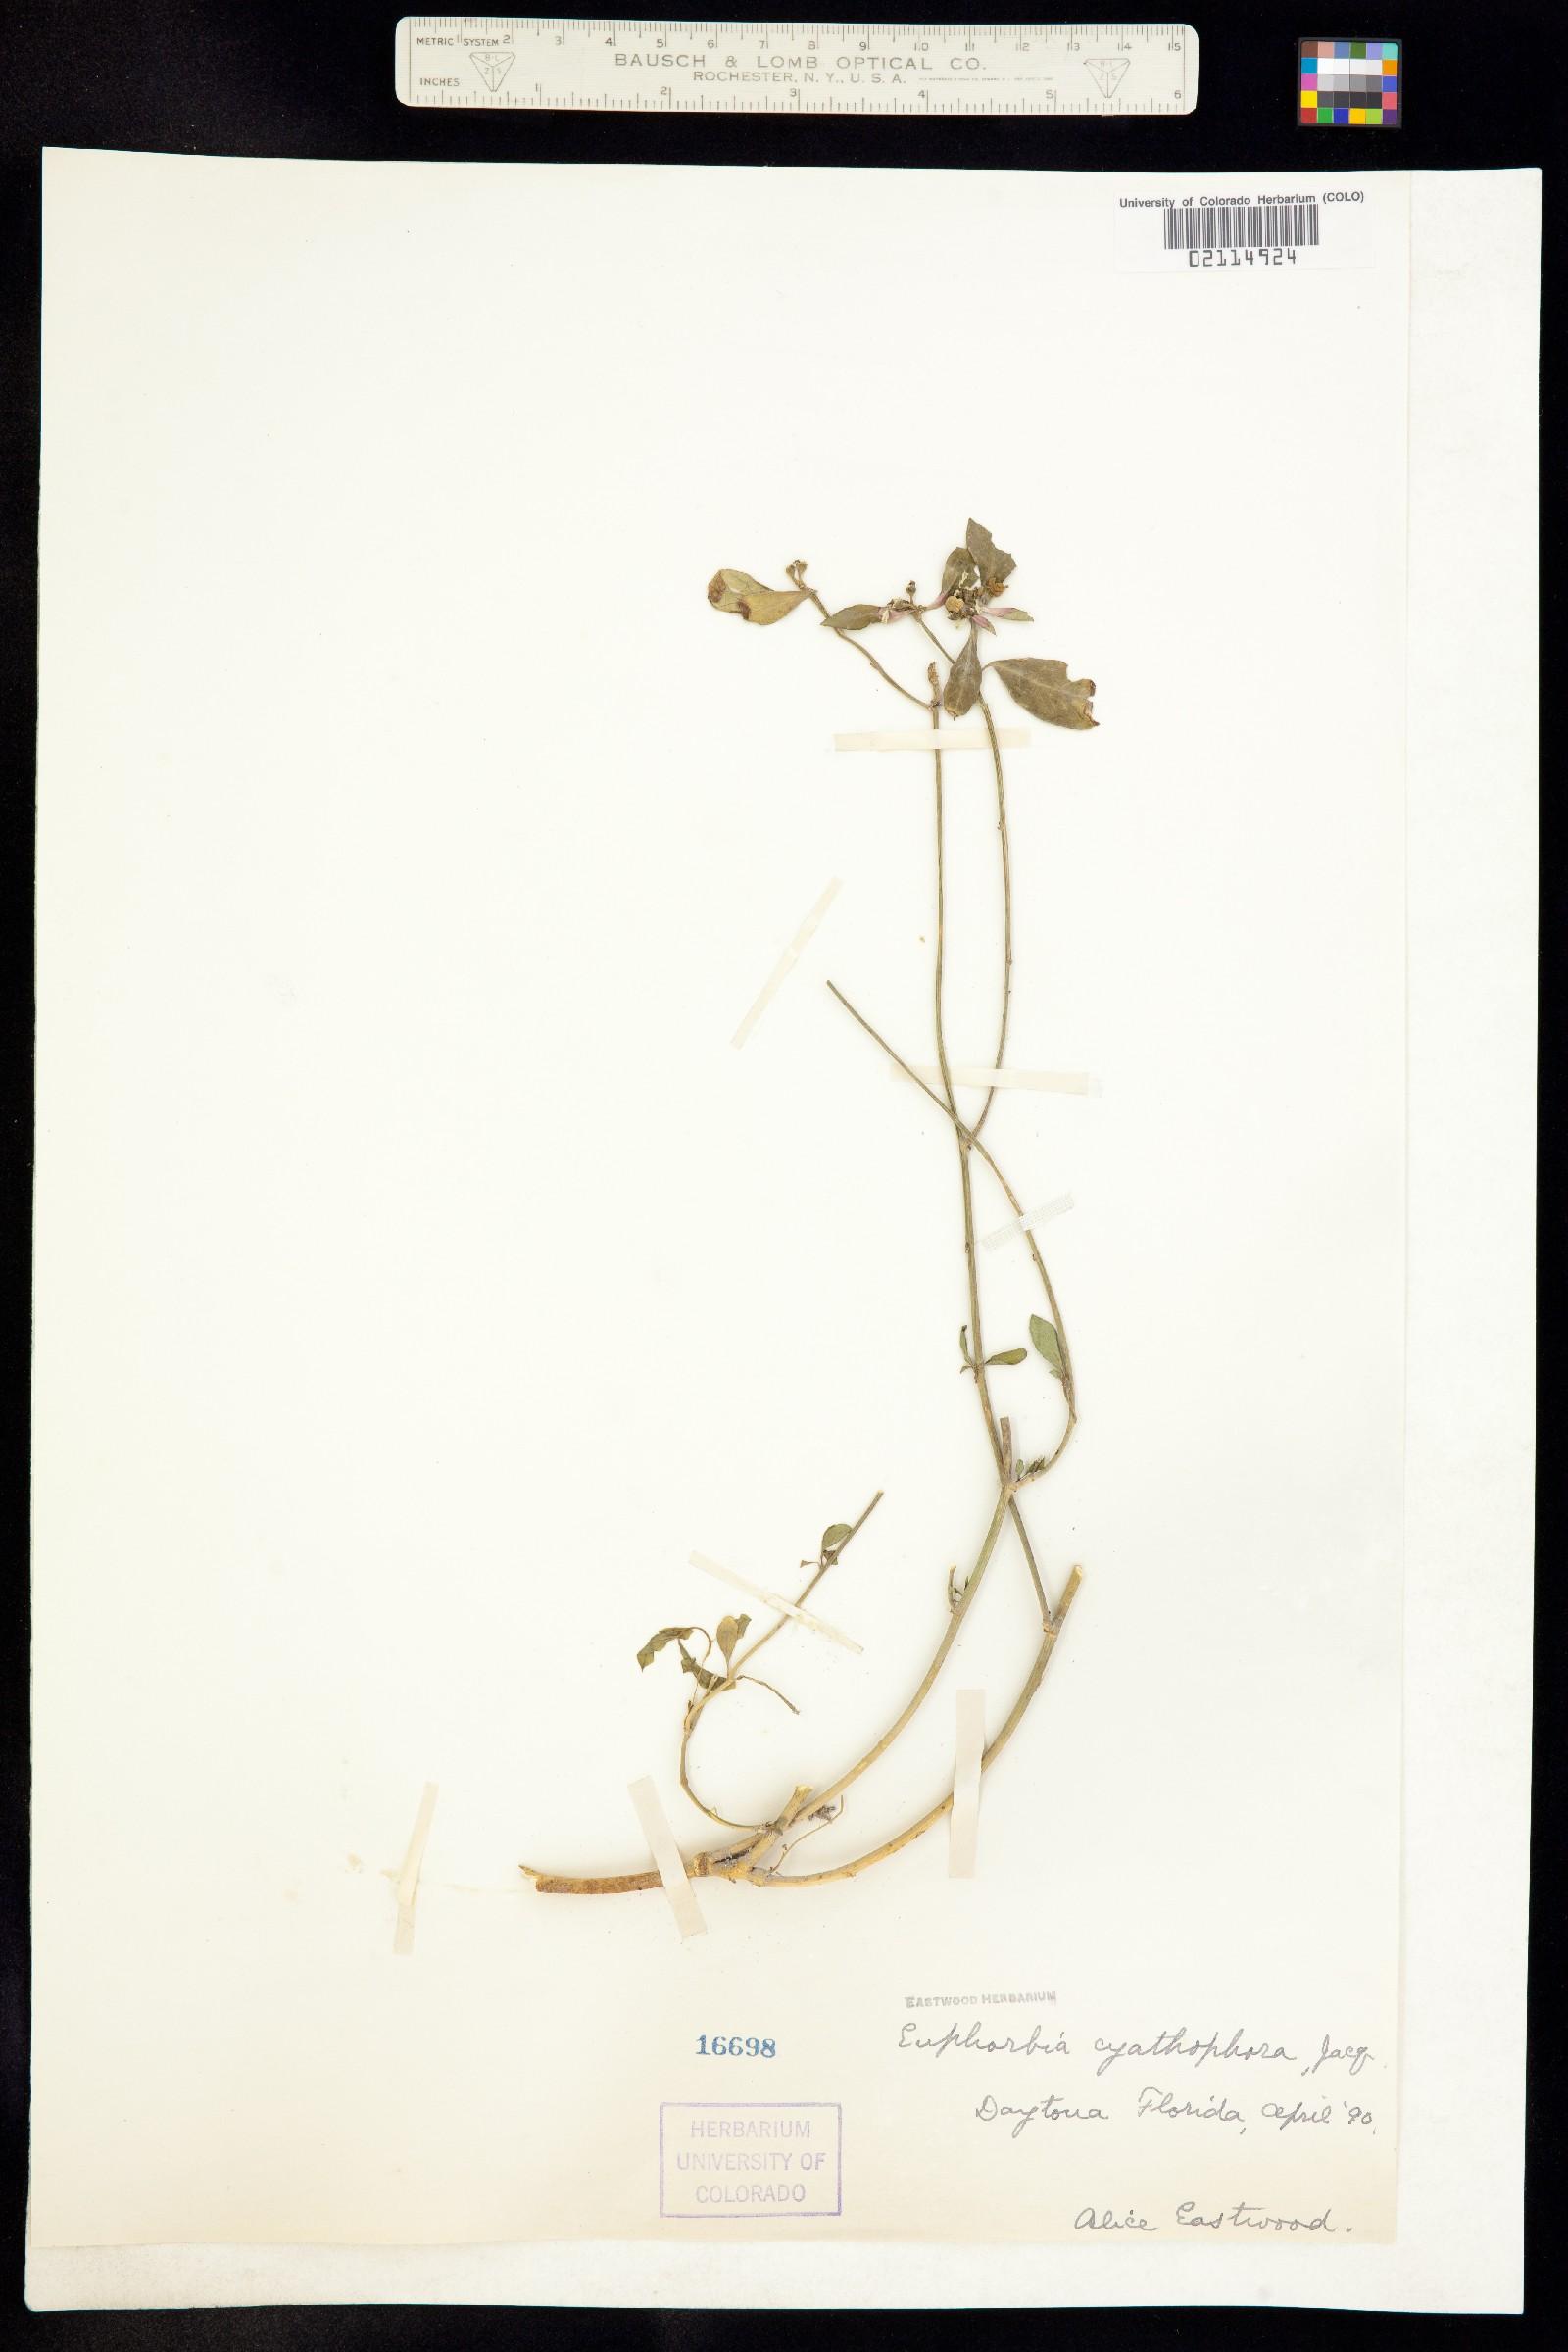 Poinsettia cyathophora image